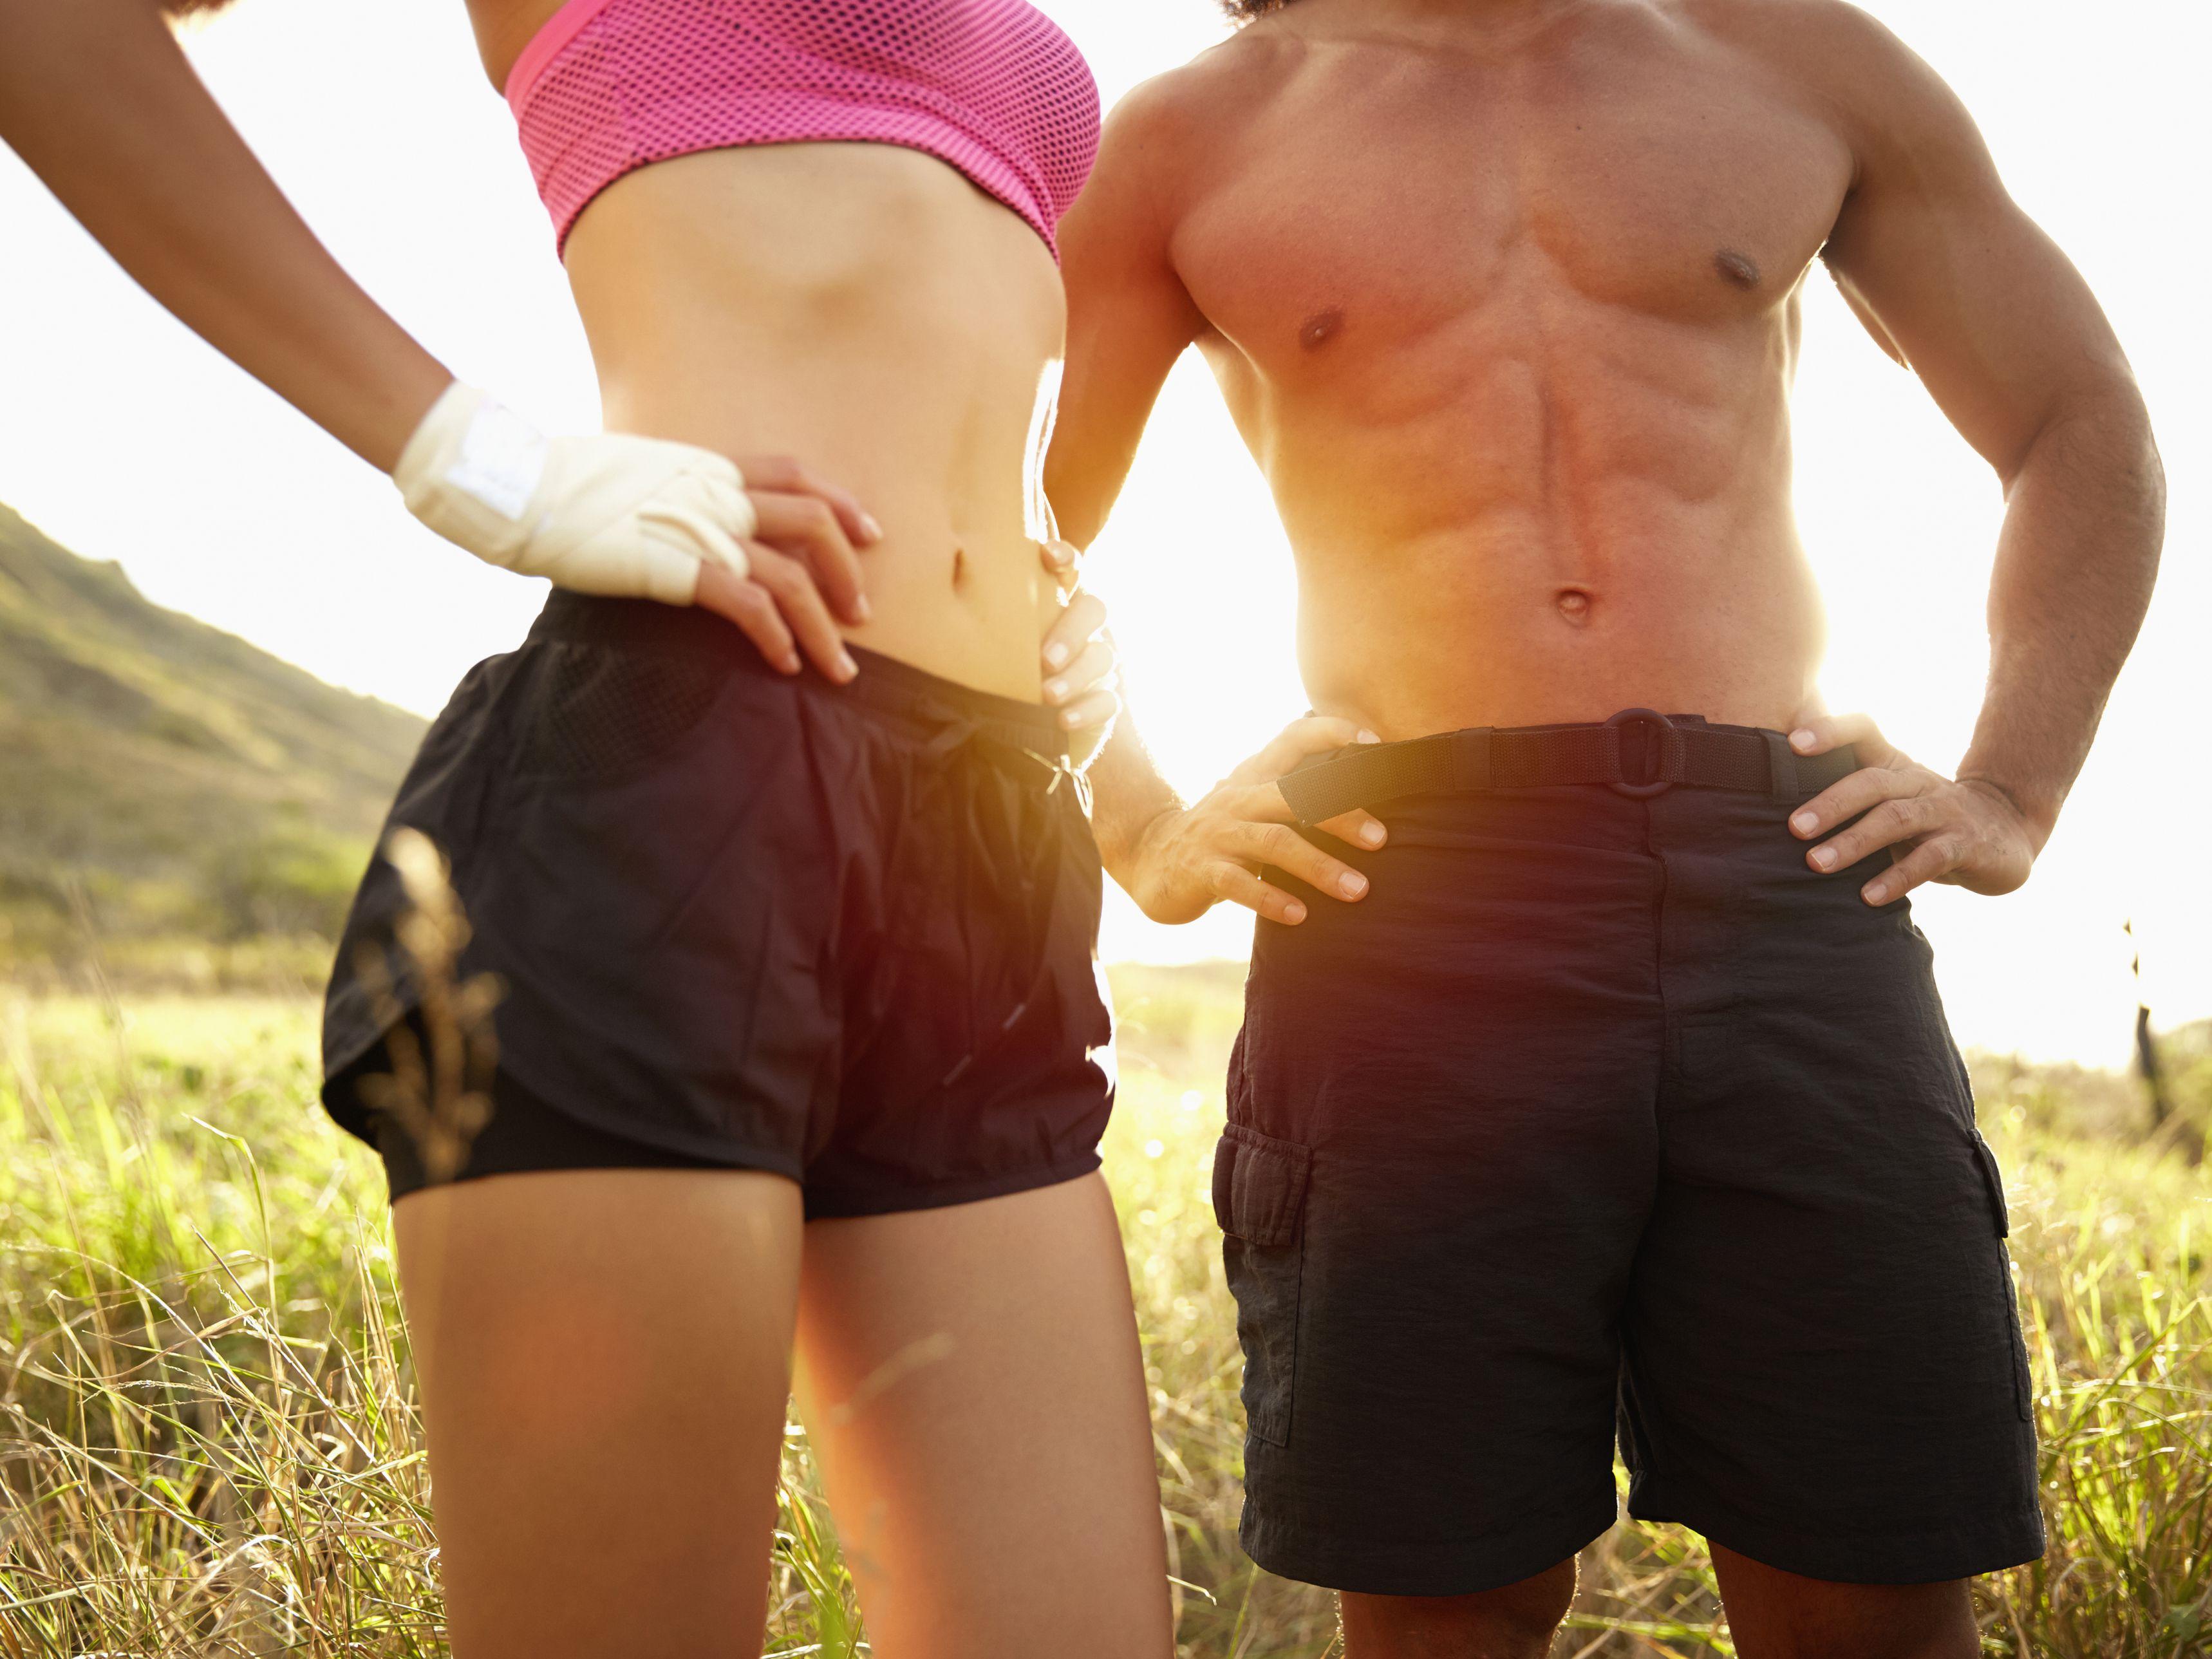 Teenage Bodybuilding Workout Routines